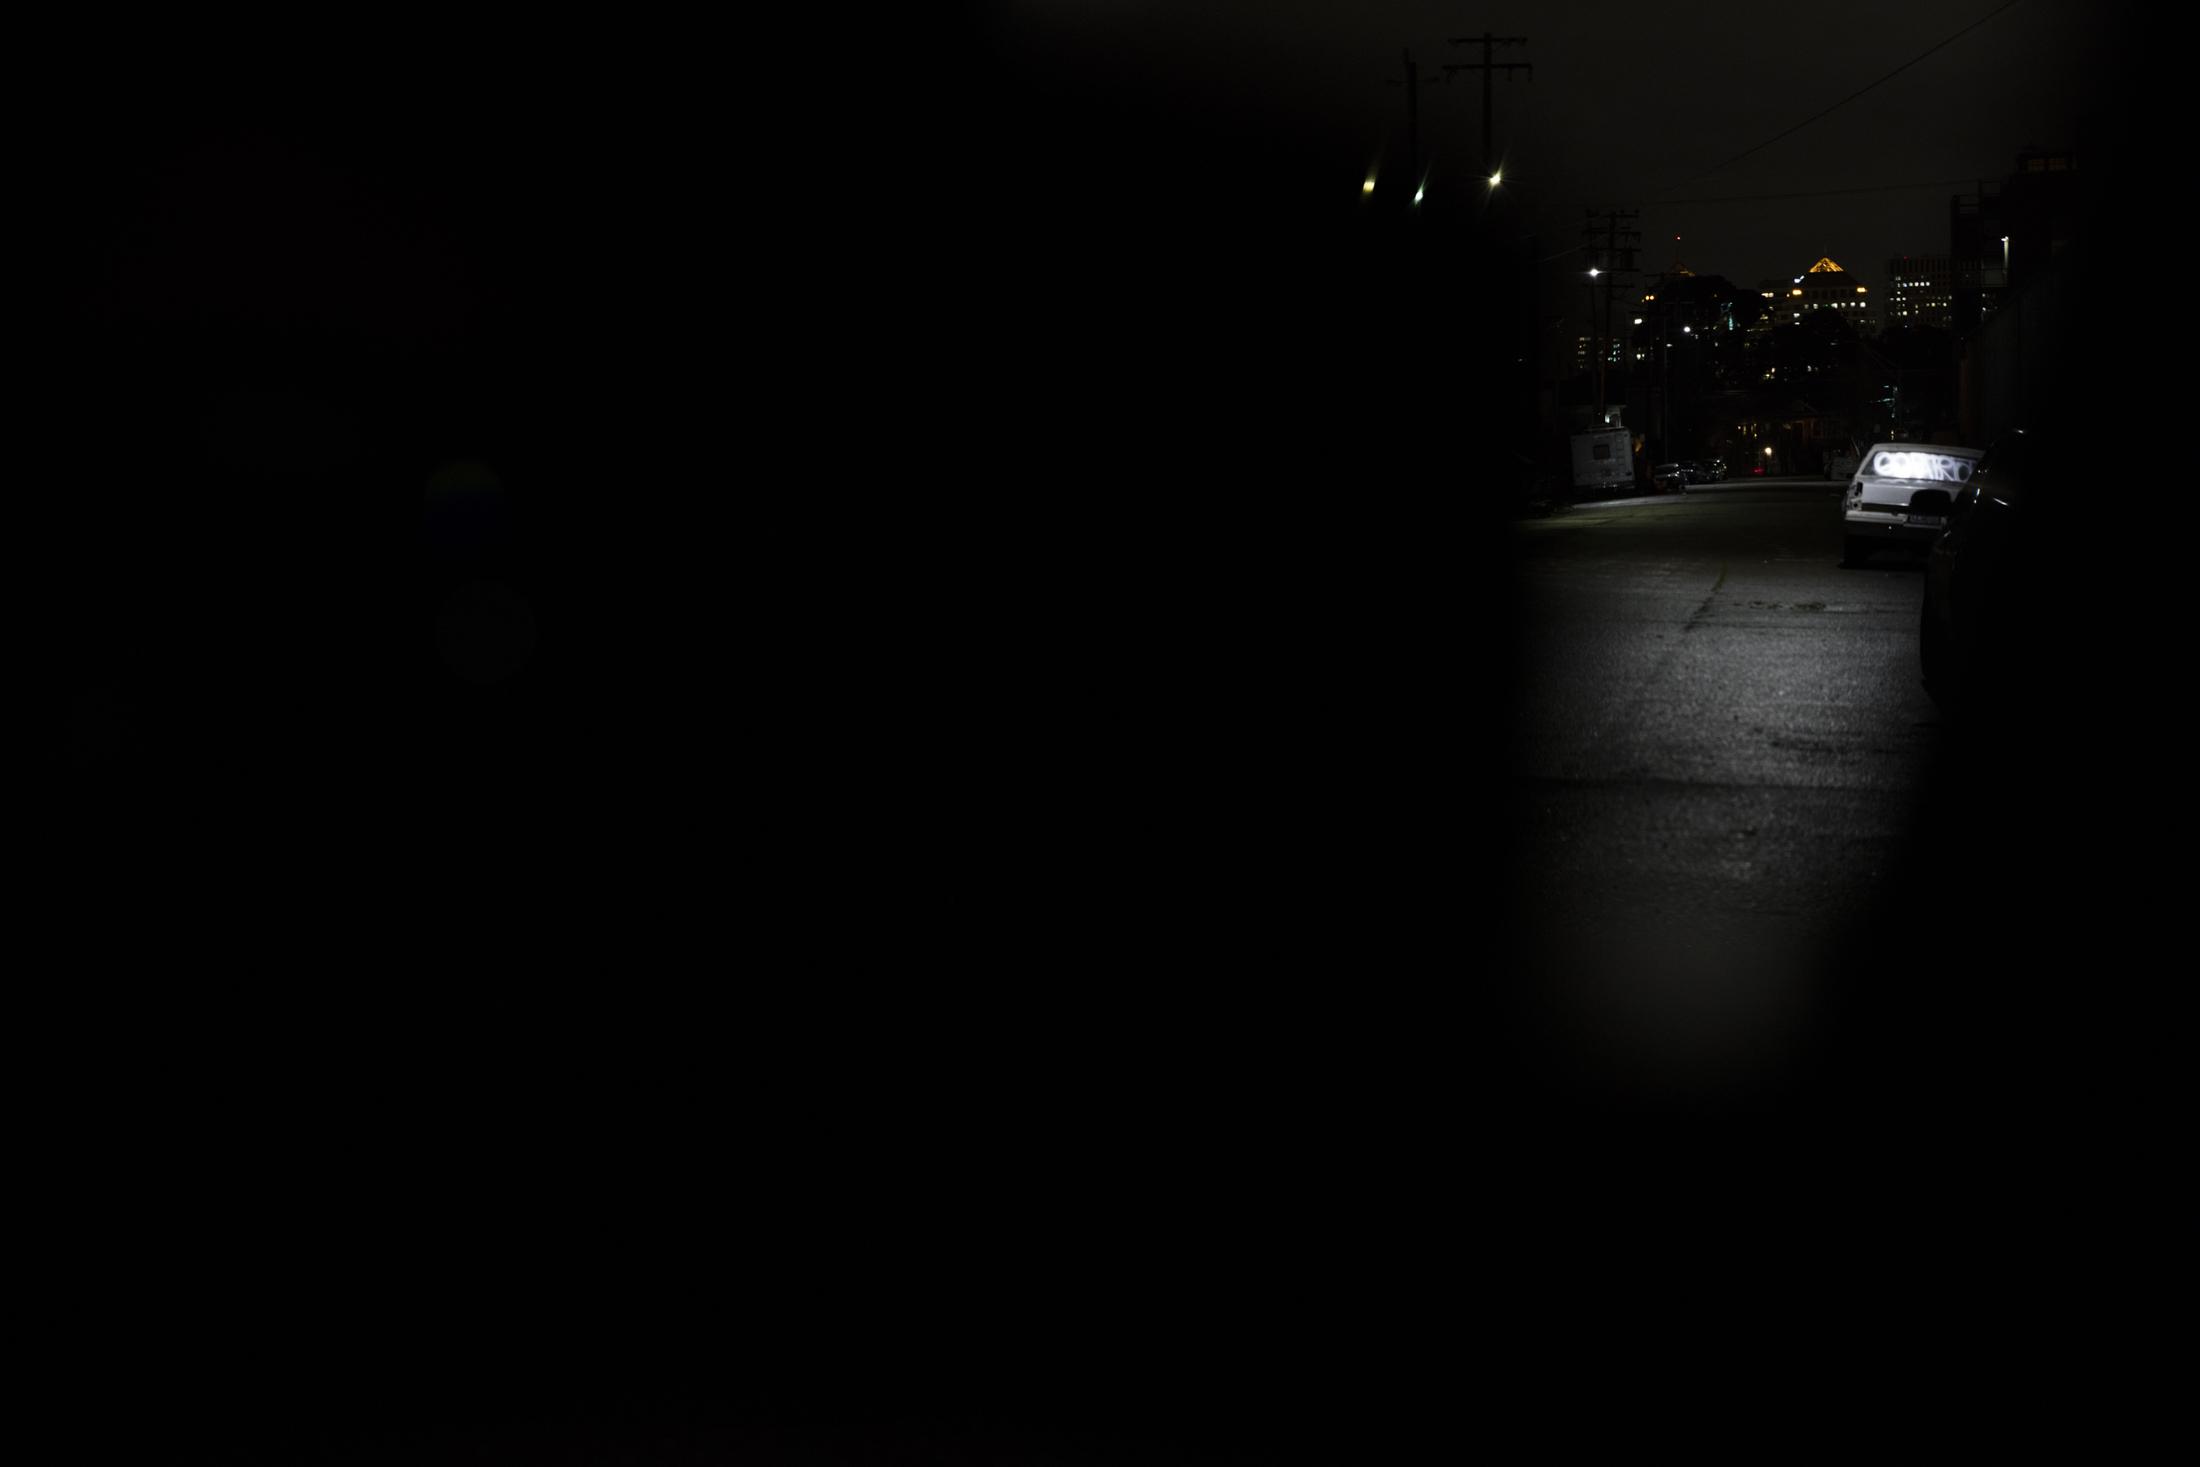 nightdrive-6.jpg